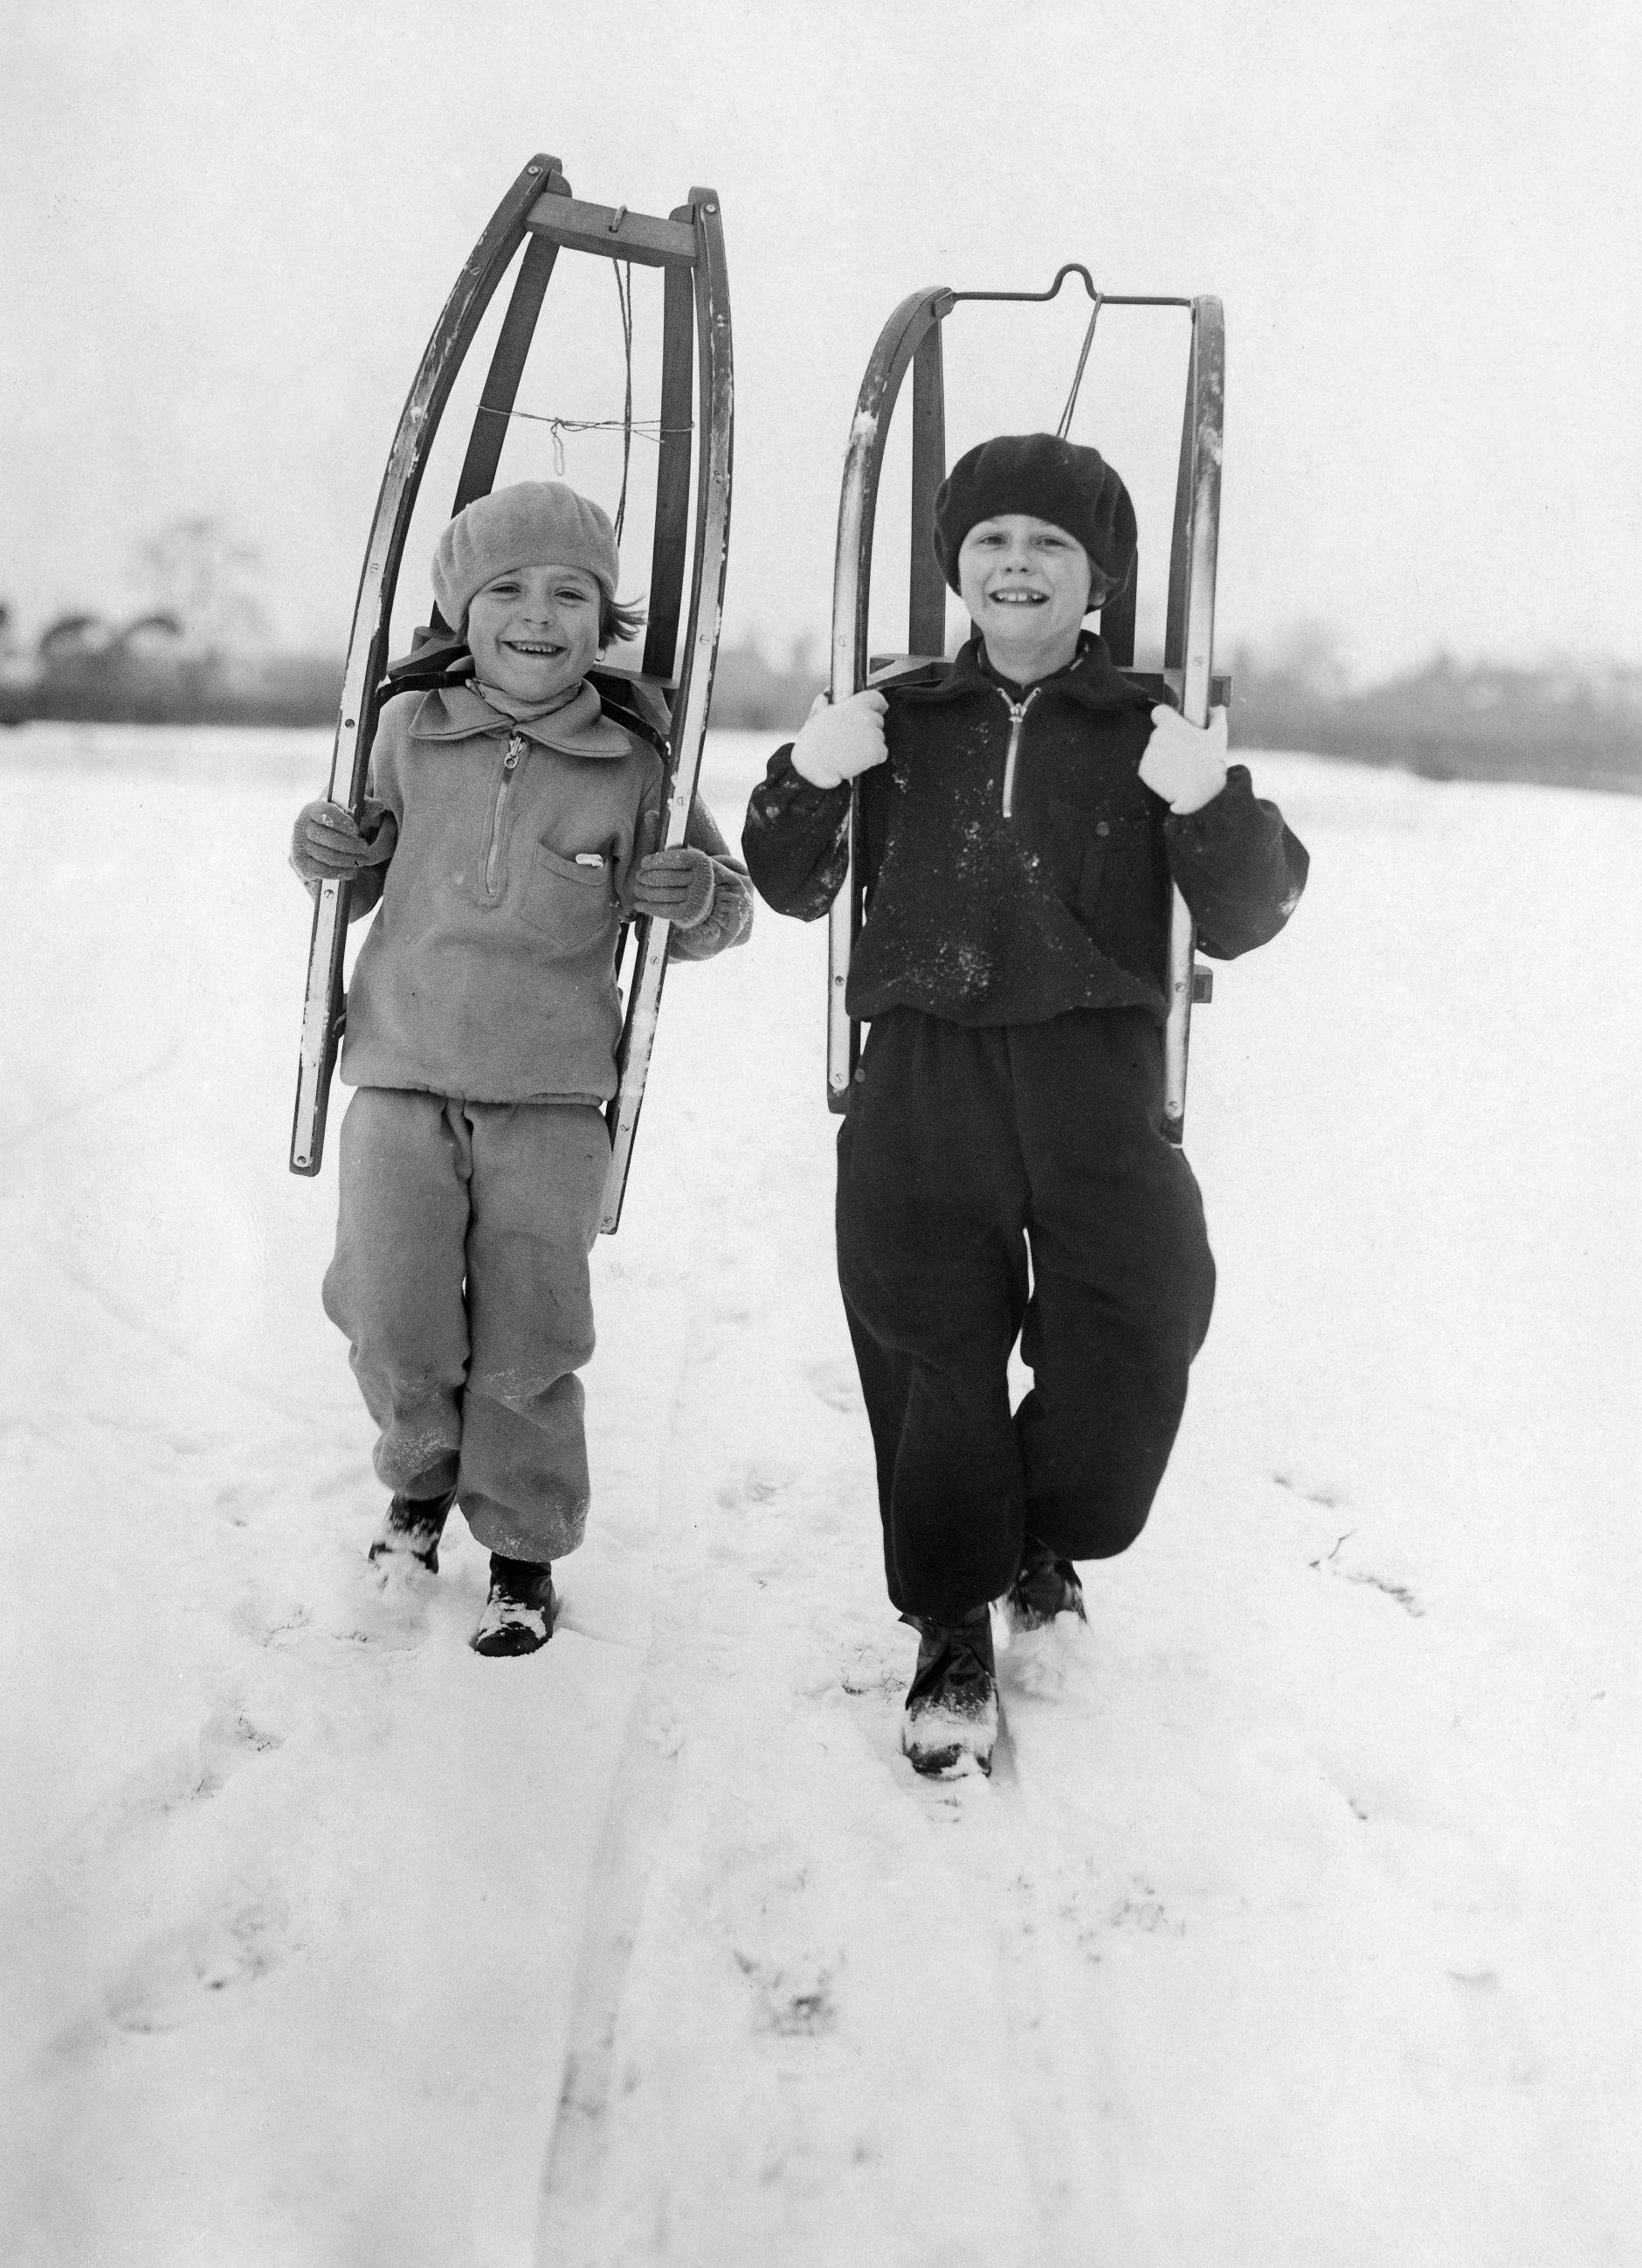 wintersport kinder gehen zum rodeln 1929 bpk. Black Bedroom Furniture Sets. Home Design Ideas